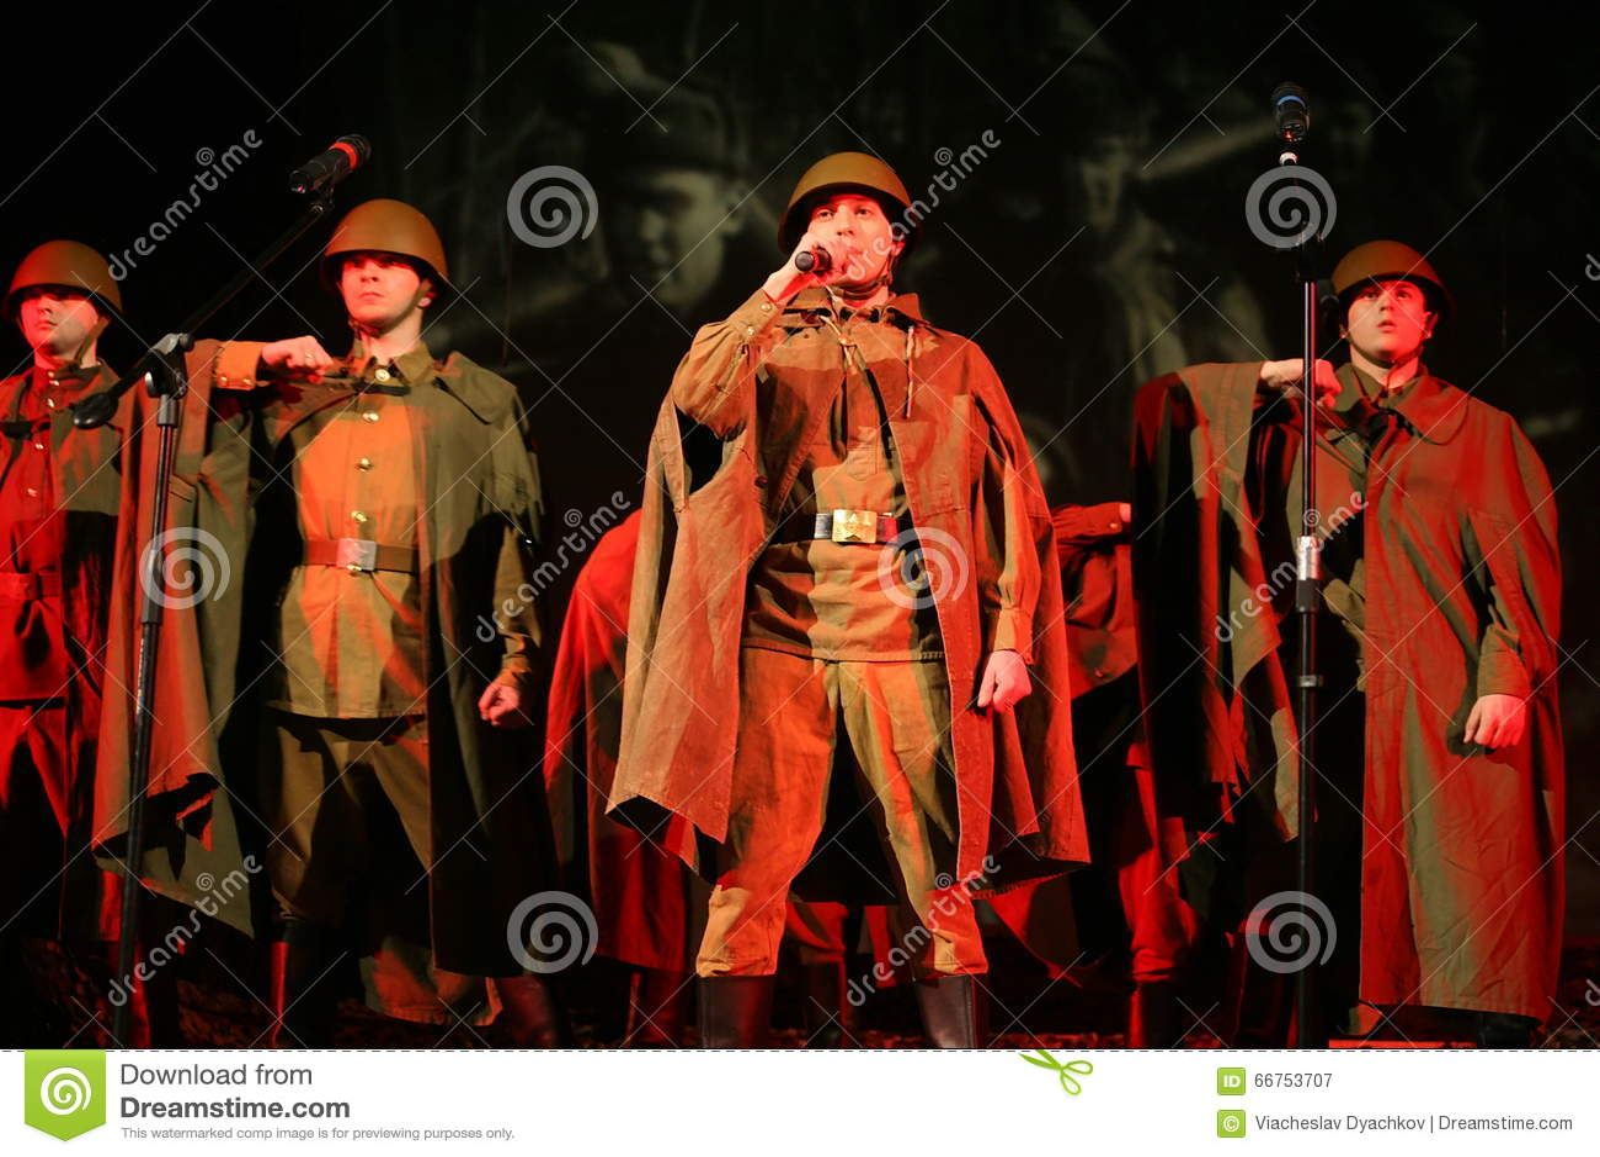 soldiers heroes of world war ii download